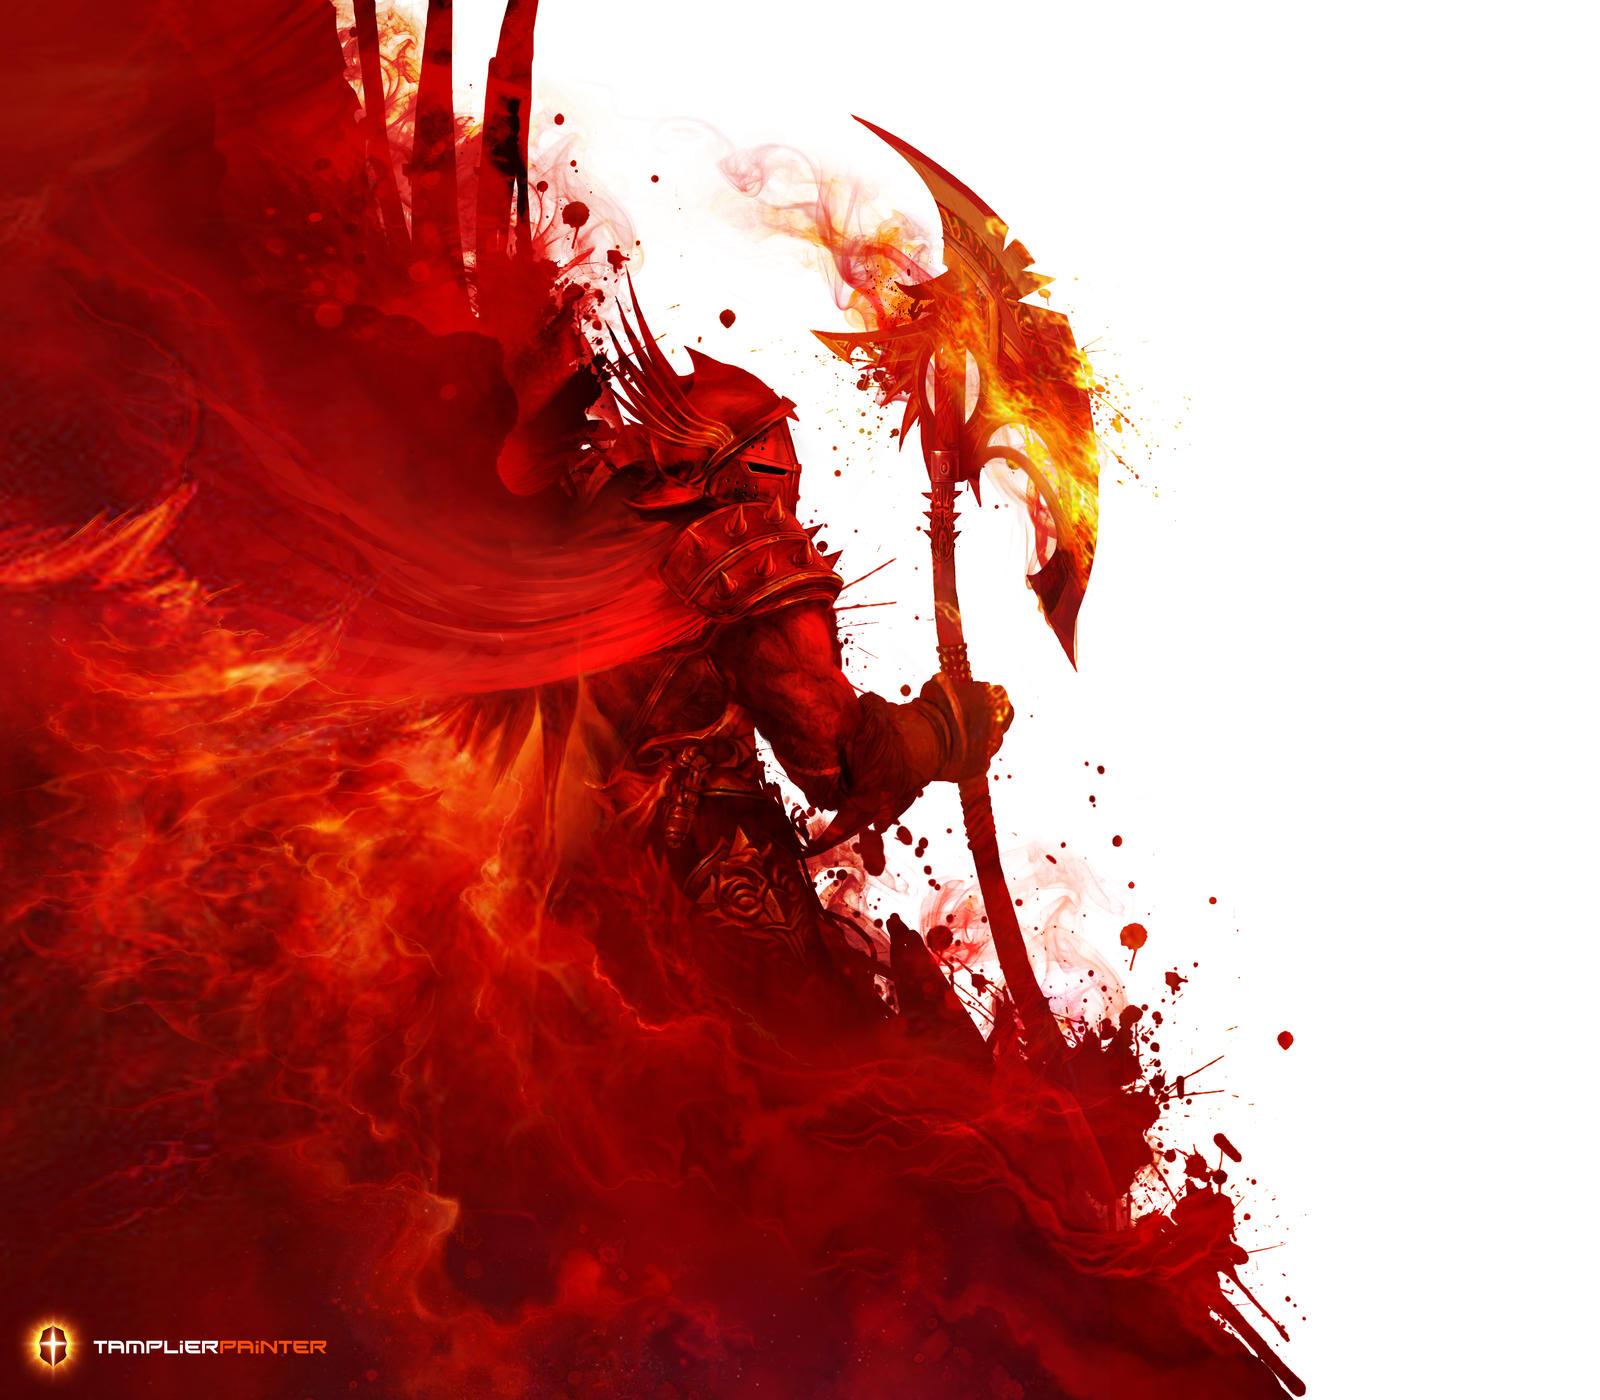 Burning spirit by TamplierPainter